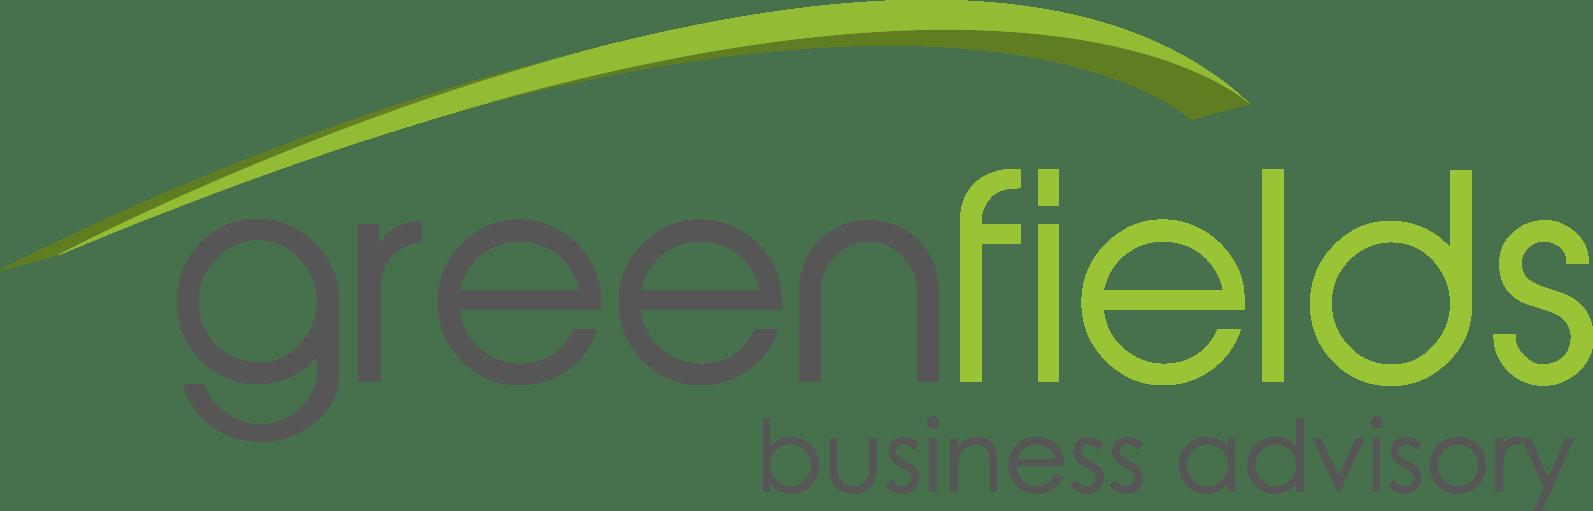 Greenfields Business Advisory